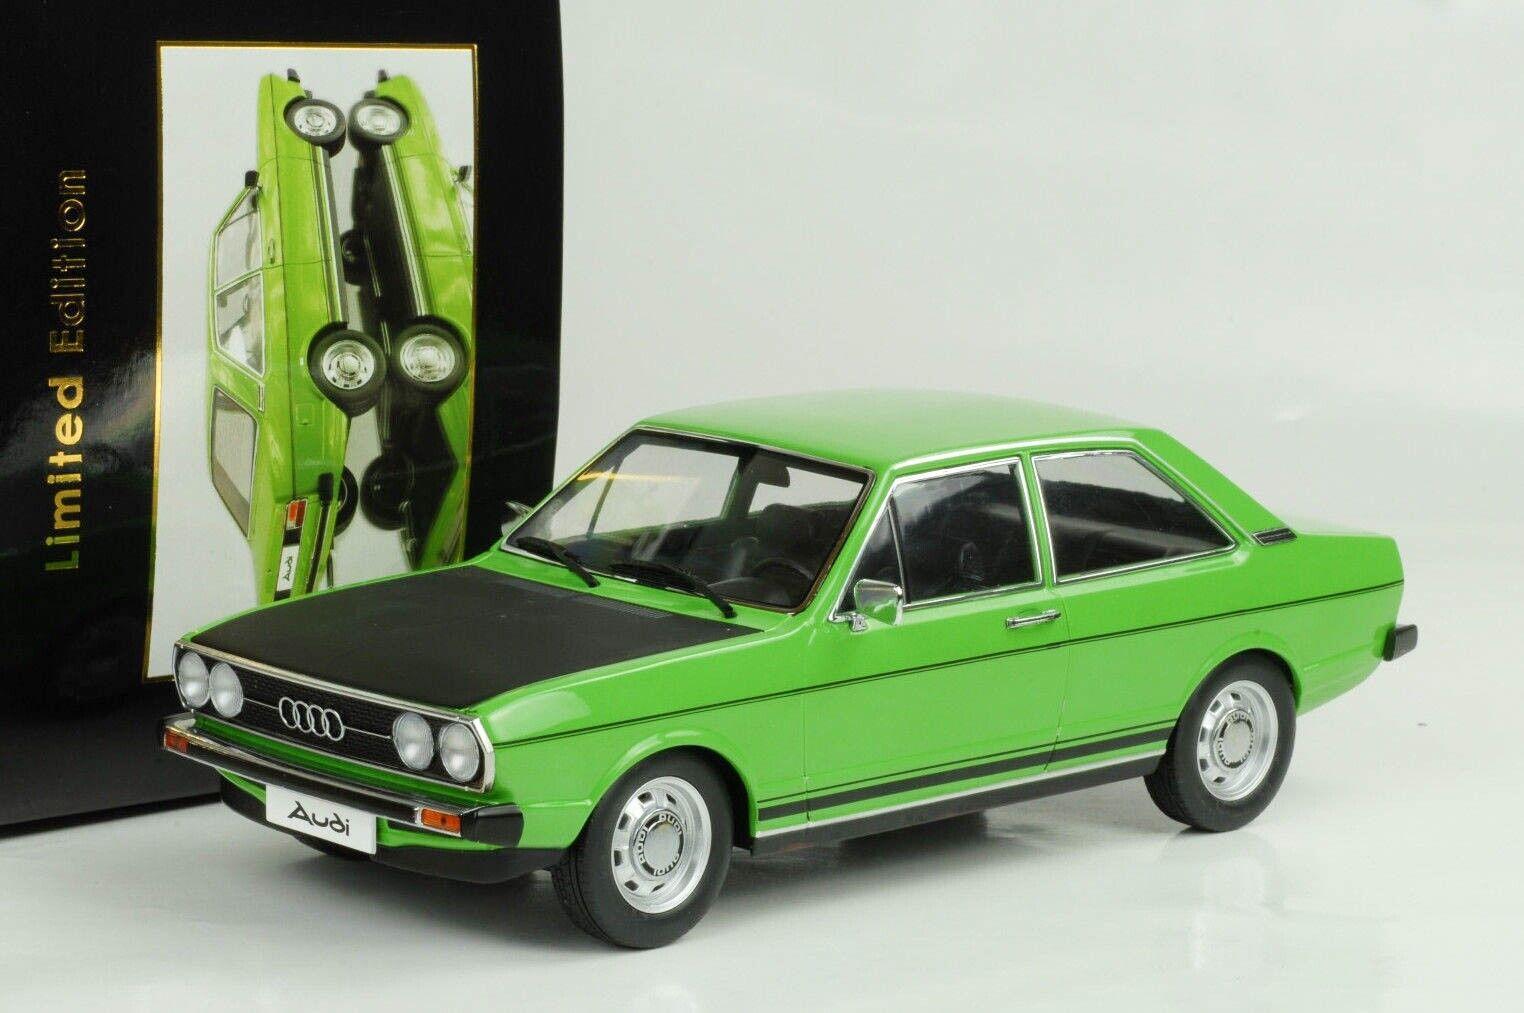 1975 1978 audi b1 80 gte verde nero campana 1 18 KK DIECAST